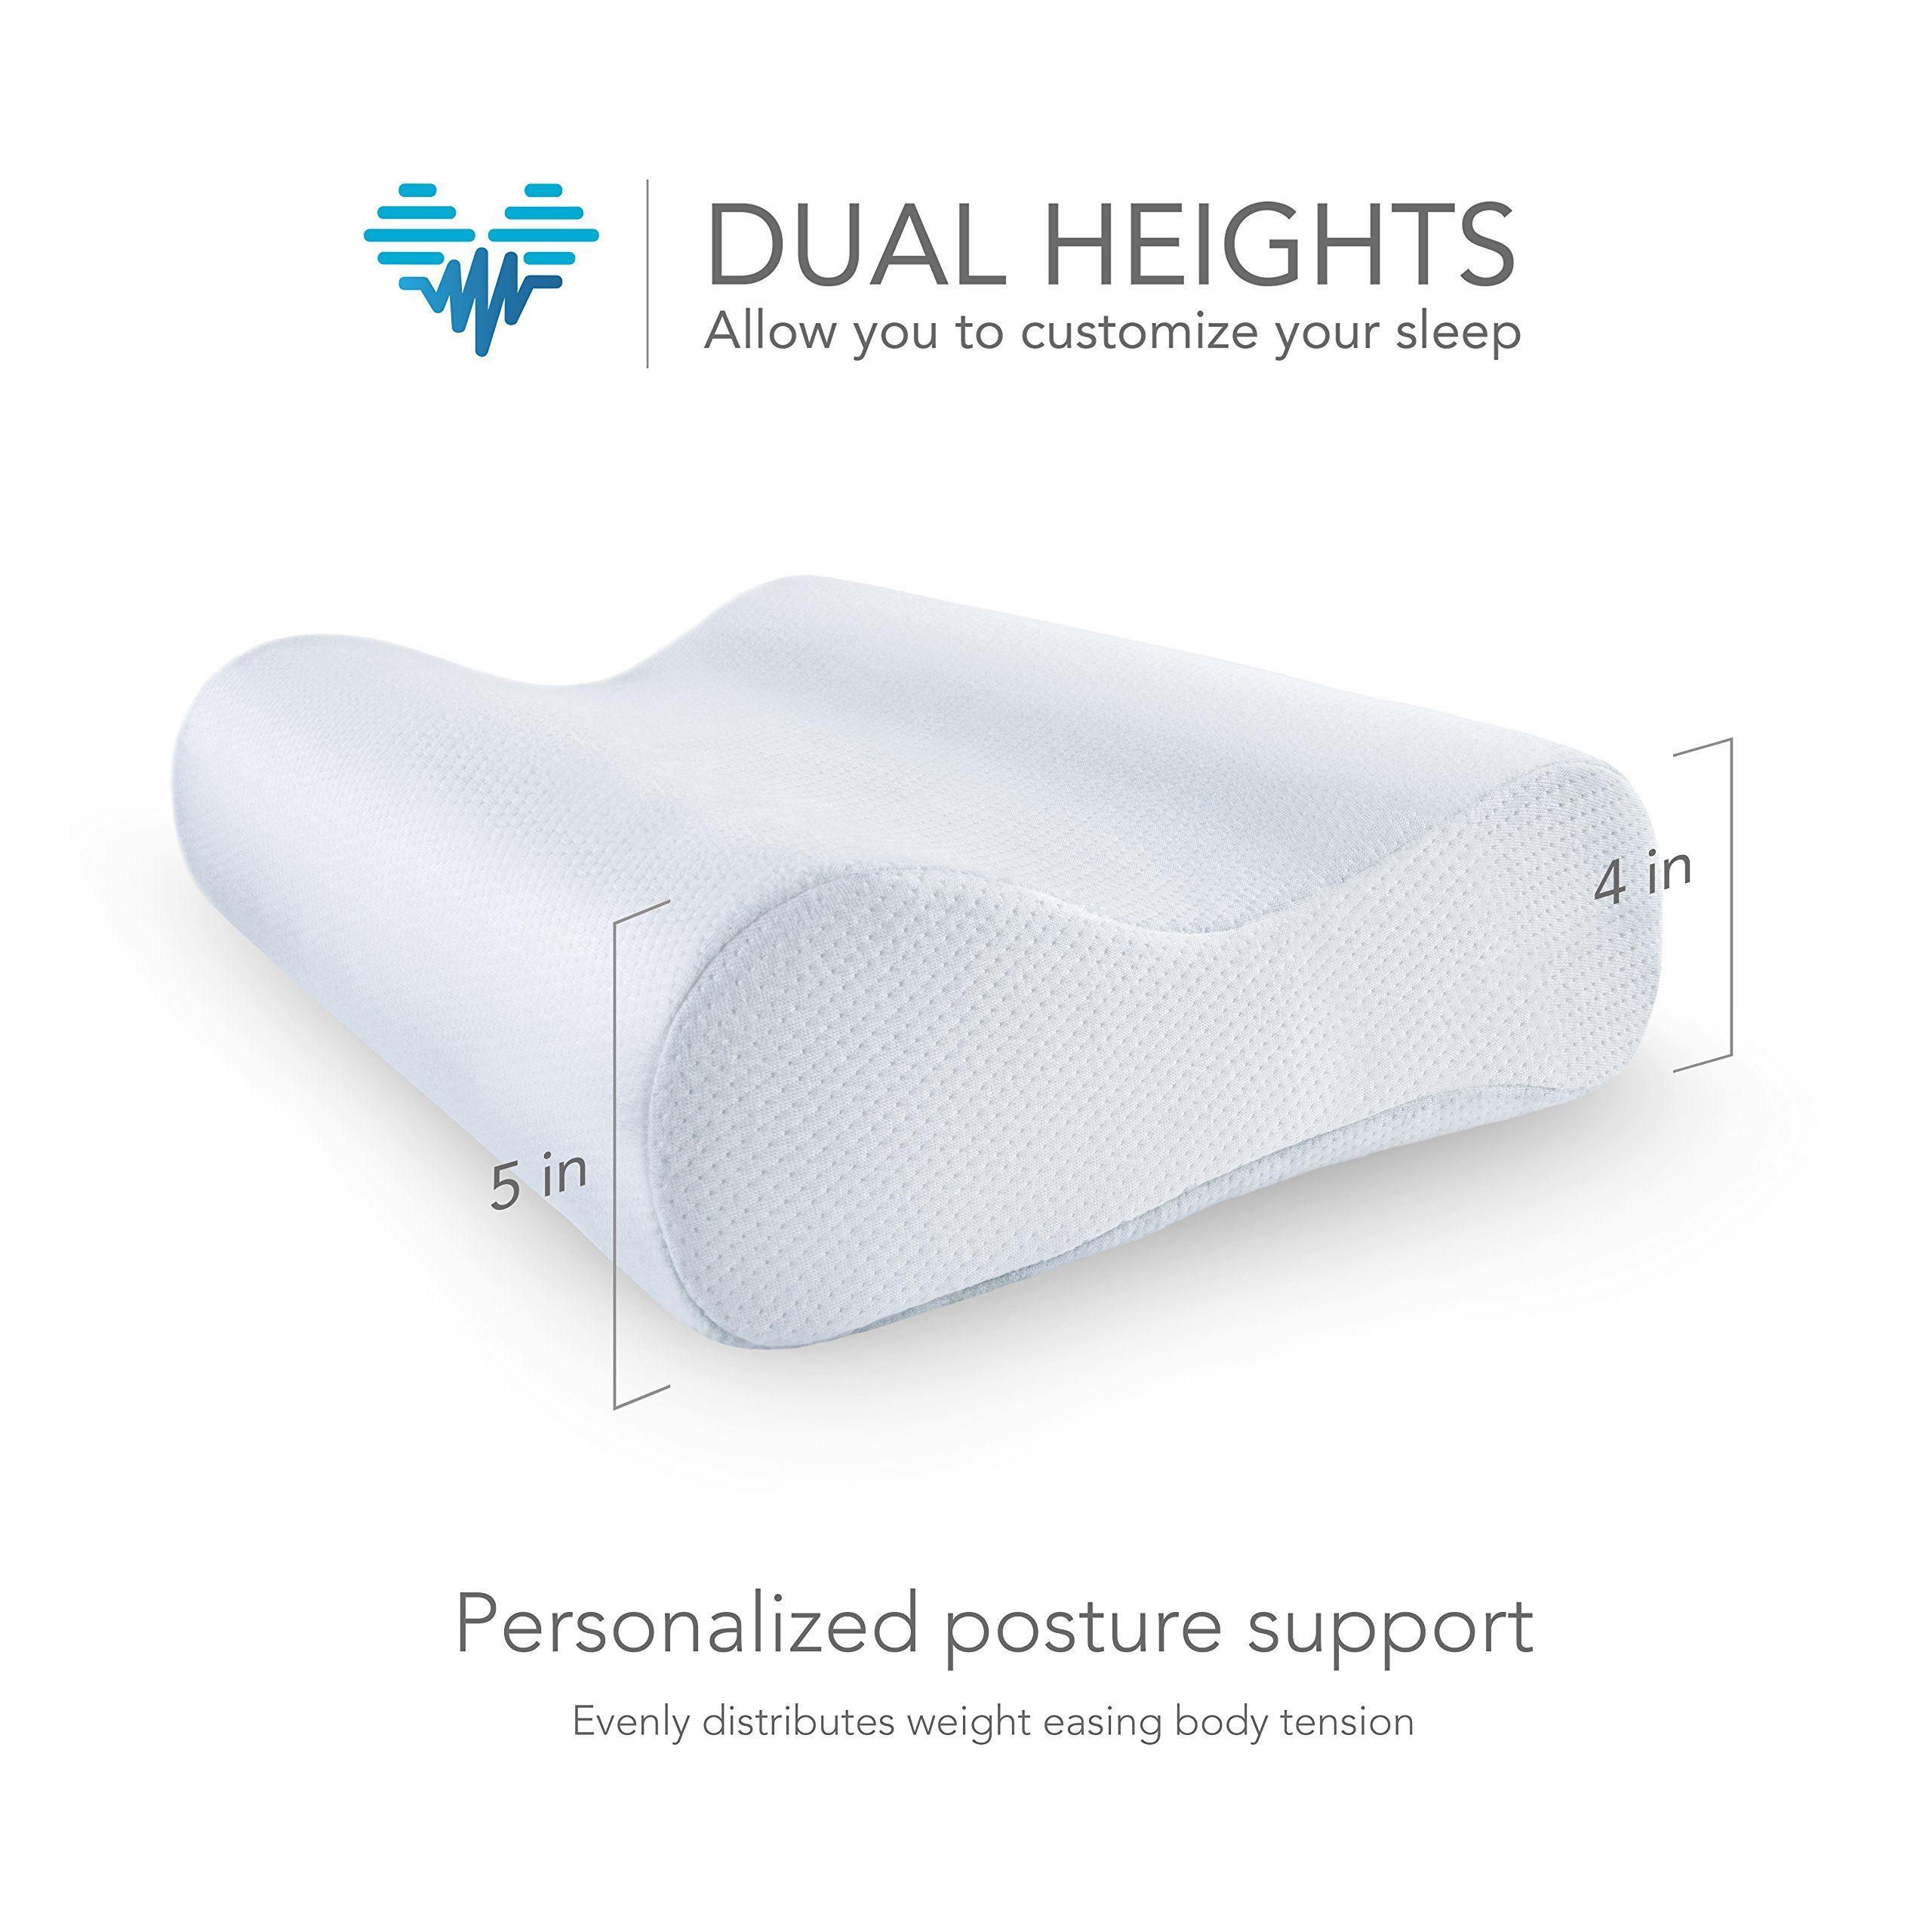 Pharmedoc Cooling Memory Foam Pillow 2 Pack Cooling Gel Infused